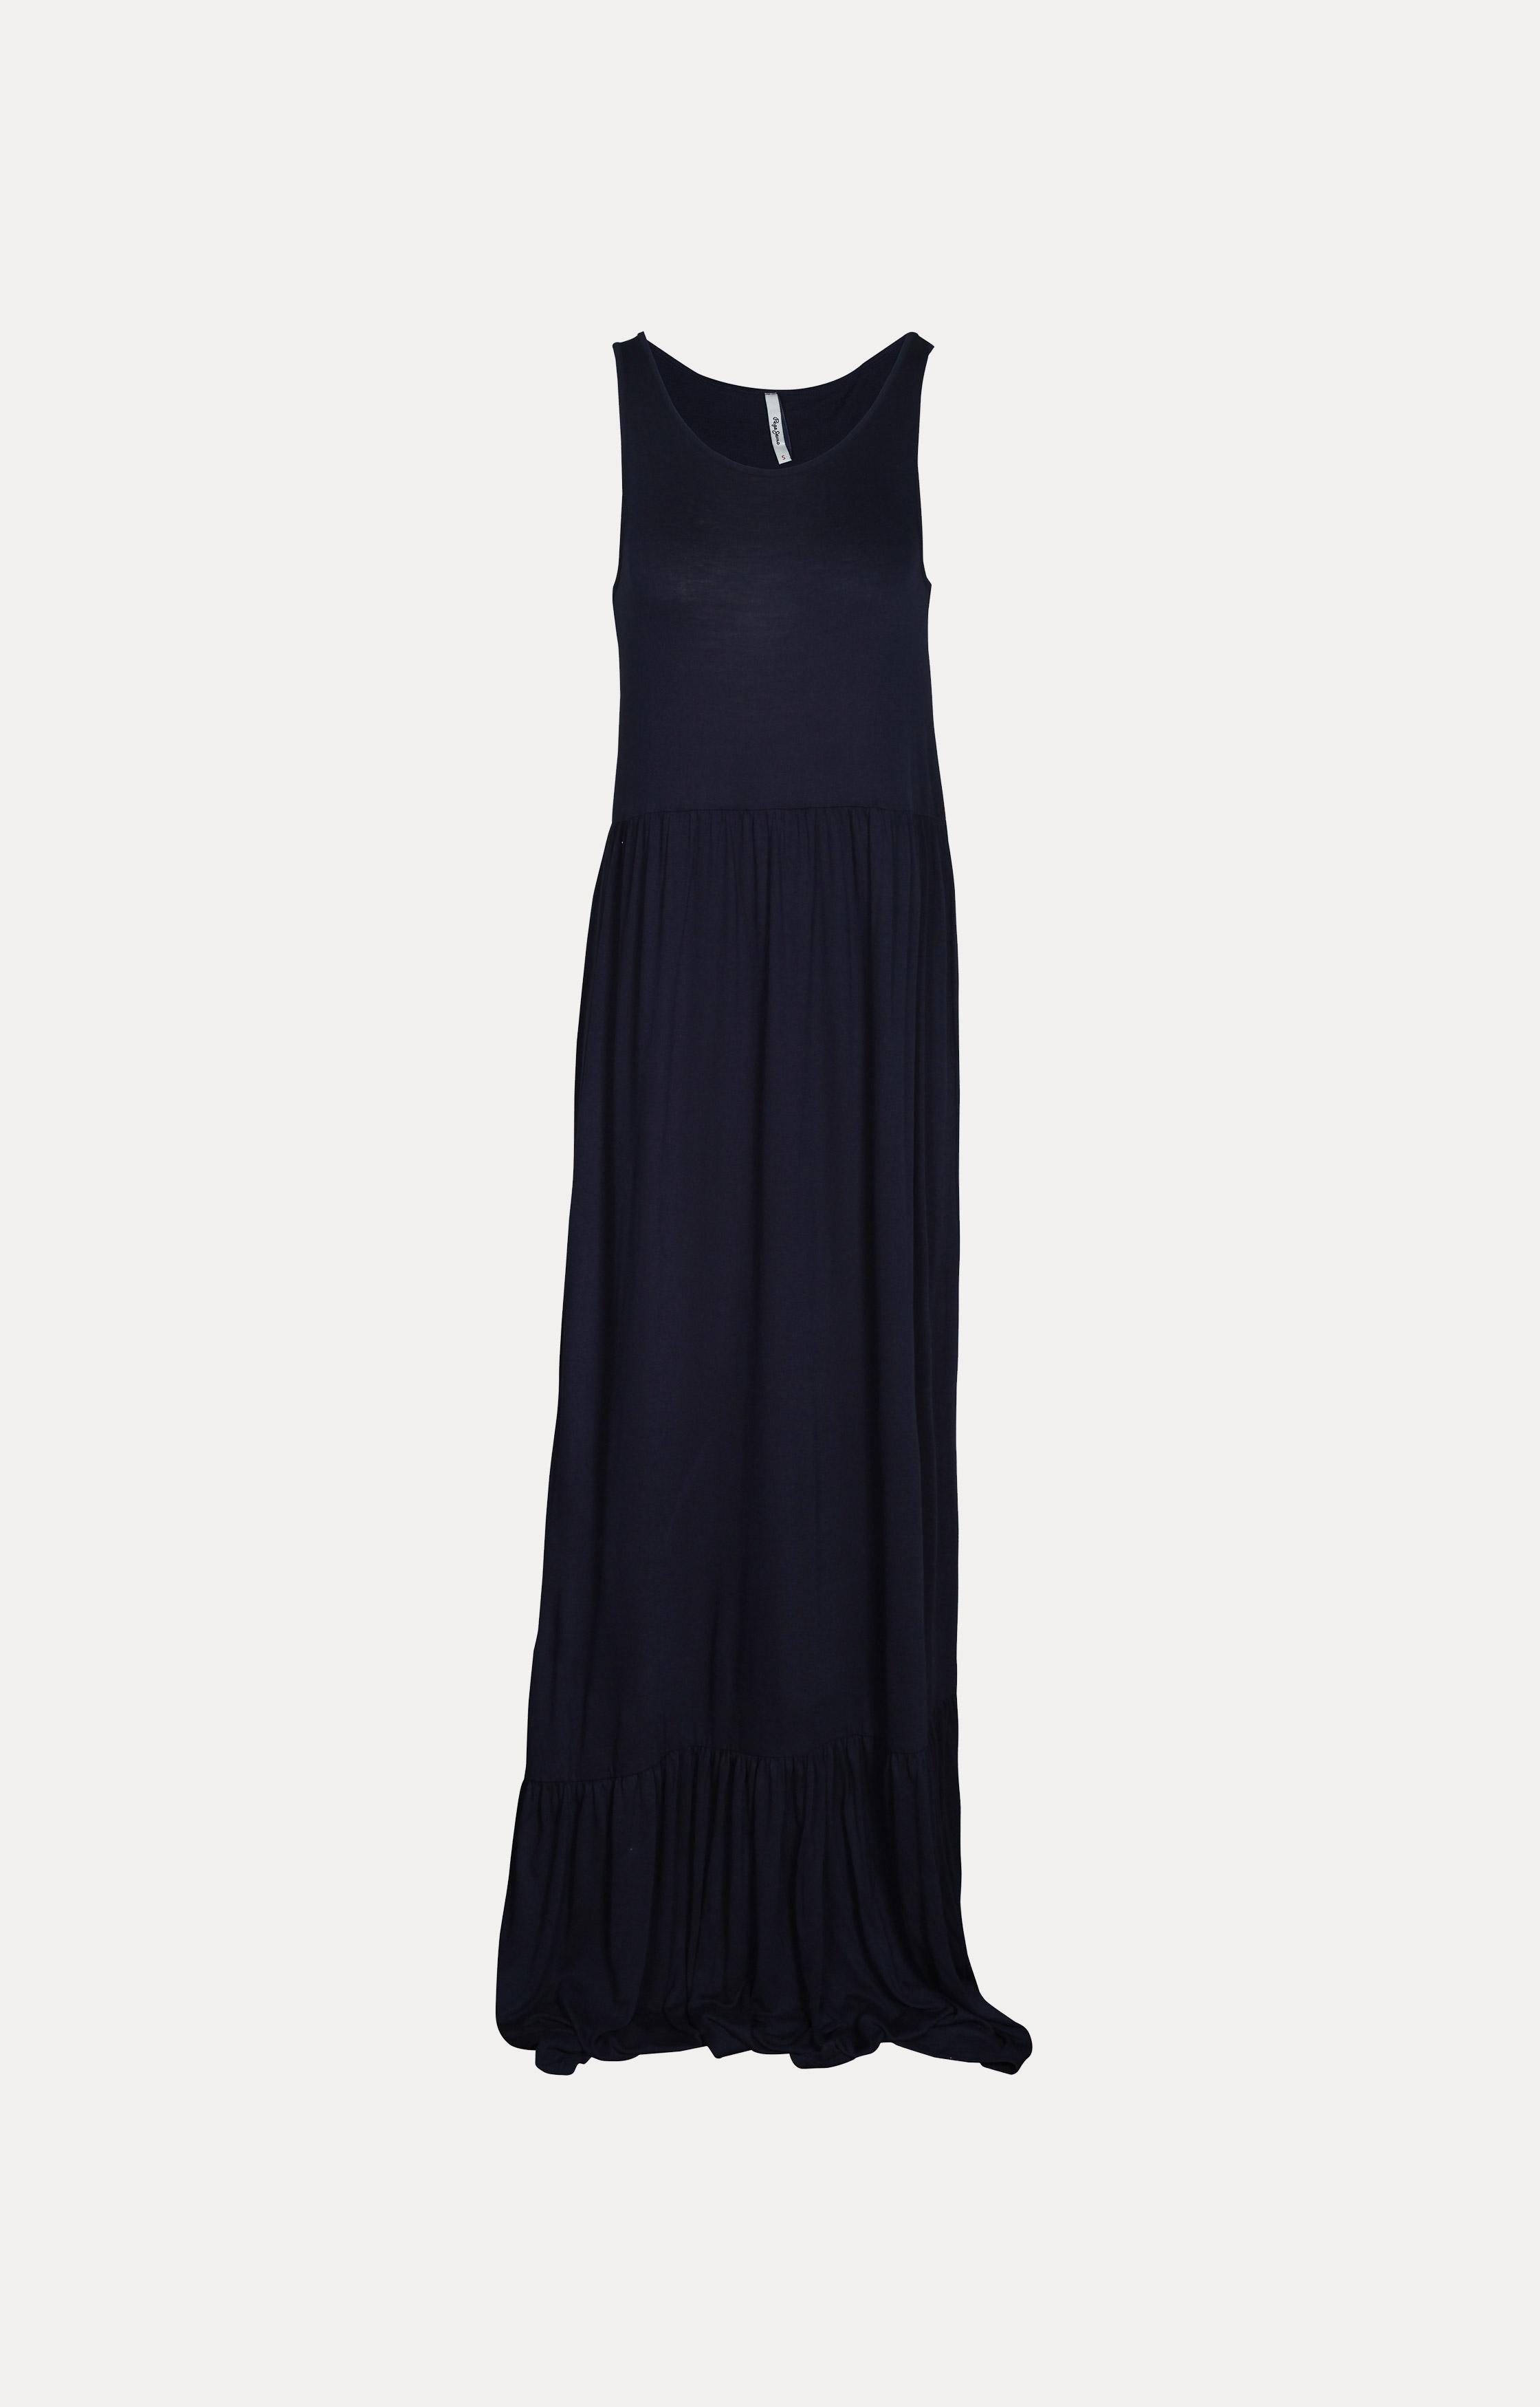 Pepe Jeans | Indigo Maxi Dress